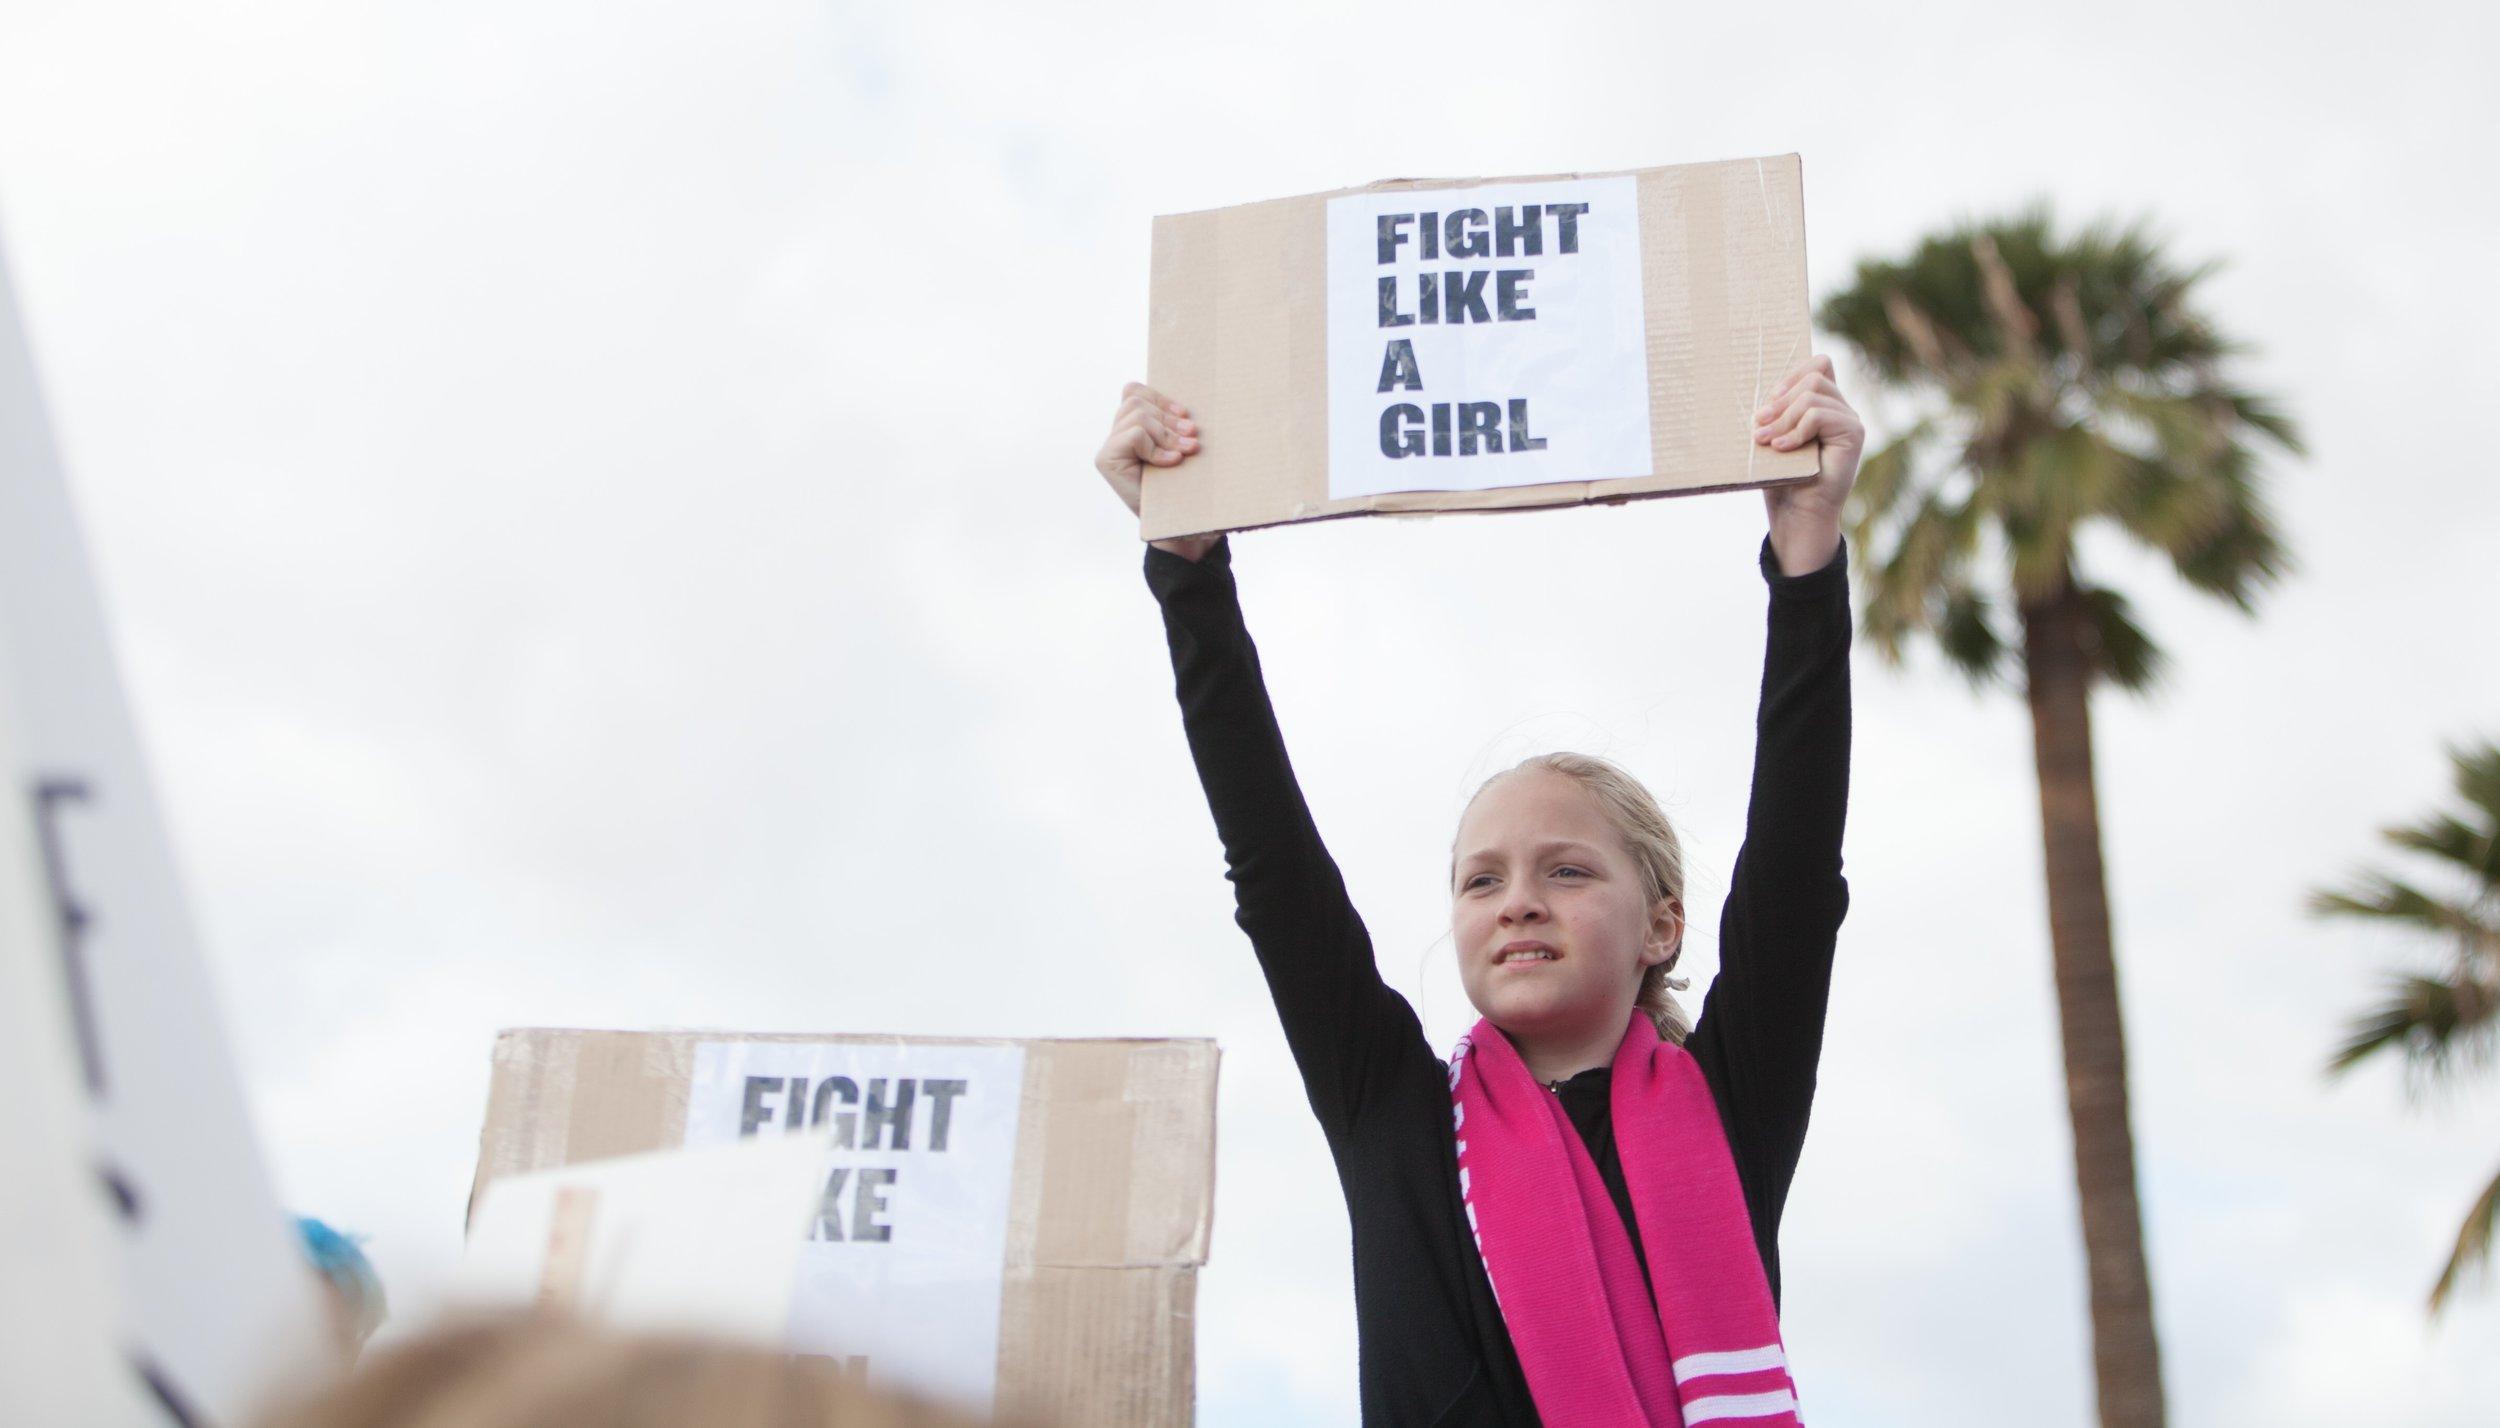 MWM - Fight like a girl sign.jpg